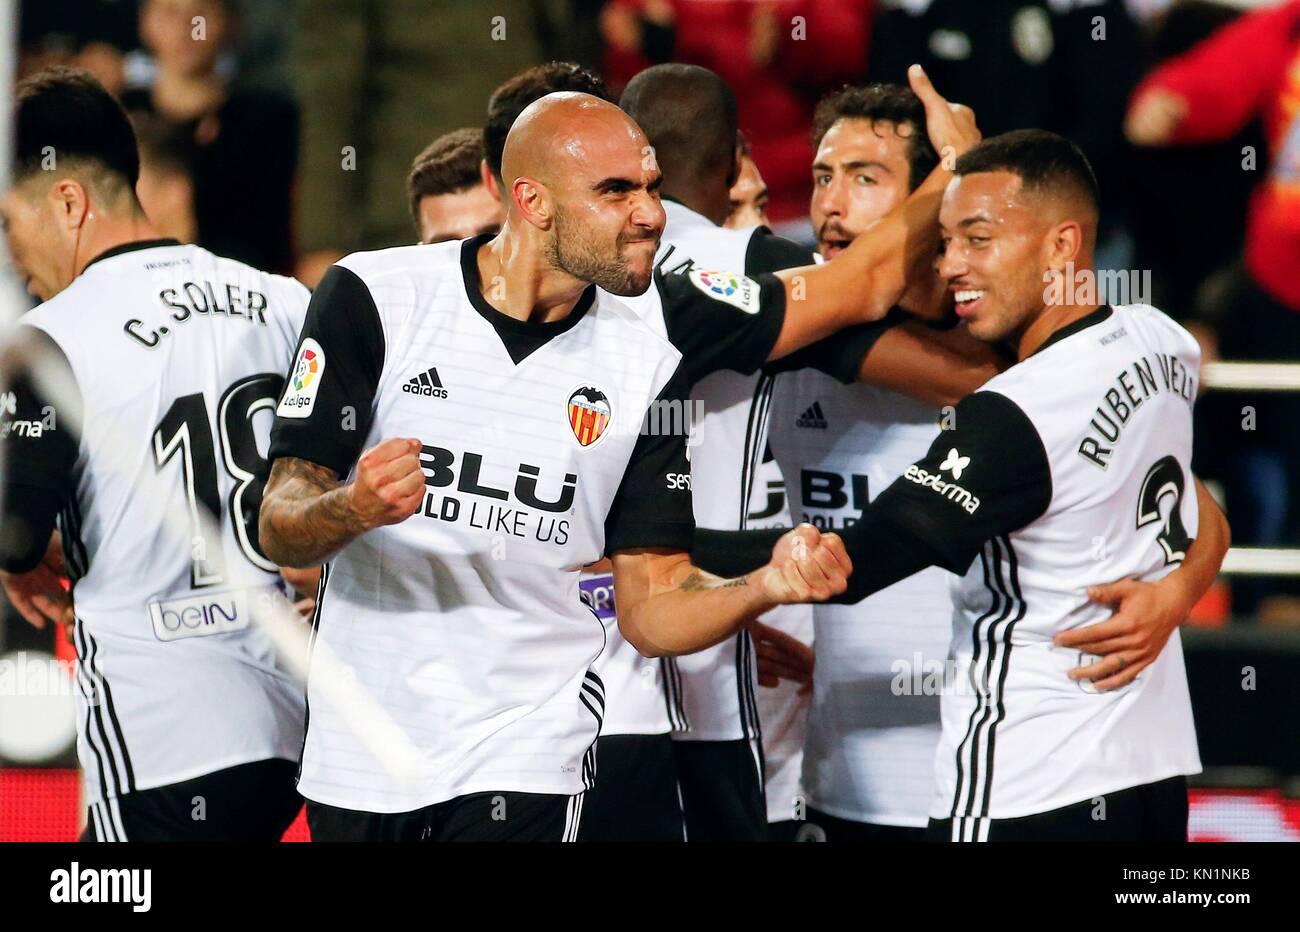 Valencia's Simone Zaza (2L) celebrates after scoring against Celta de Vigo during the La Liga first divison - Stock Image